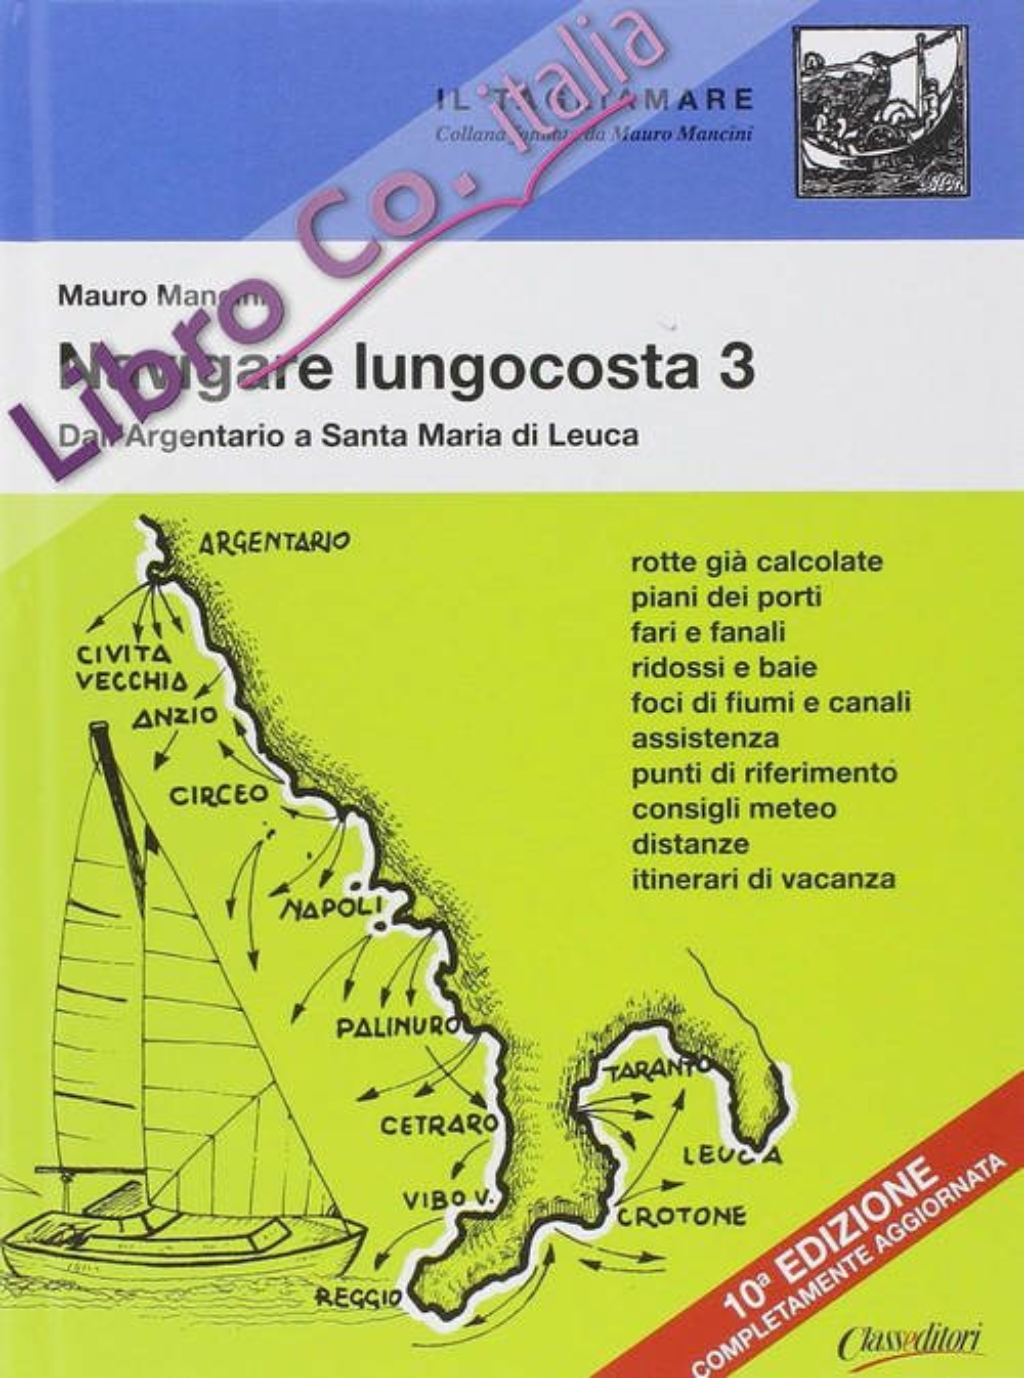 Navigare lungocosta. Vol. 3: Dall'Argentario a S. Maria di Leuca